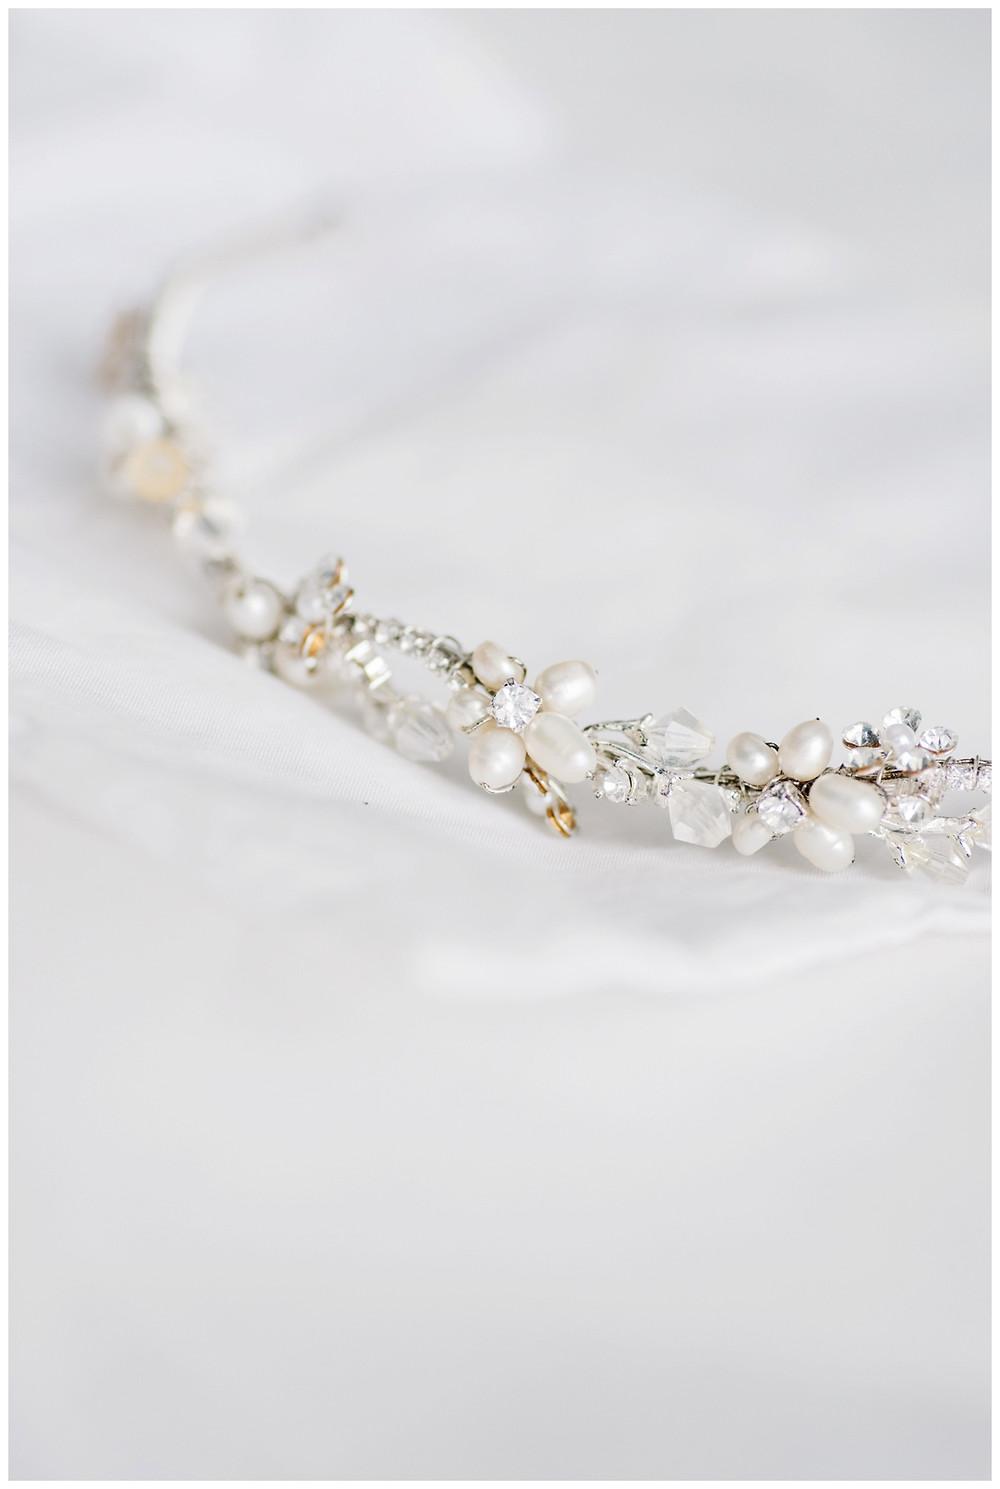 wedding-tiara-details-at-milwaukee-wedding-by-green-bay-wedding-photographer-kyra-rane-photographer